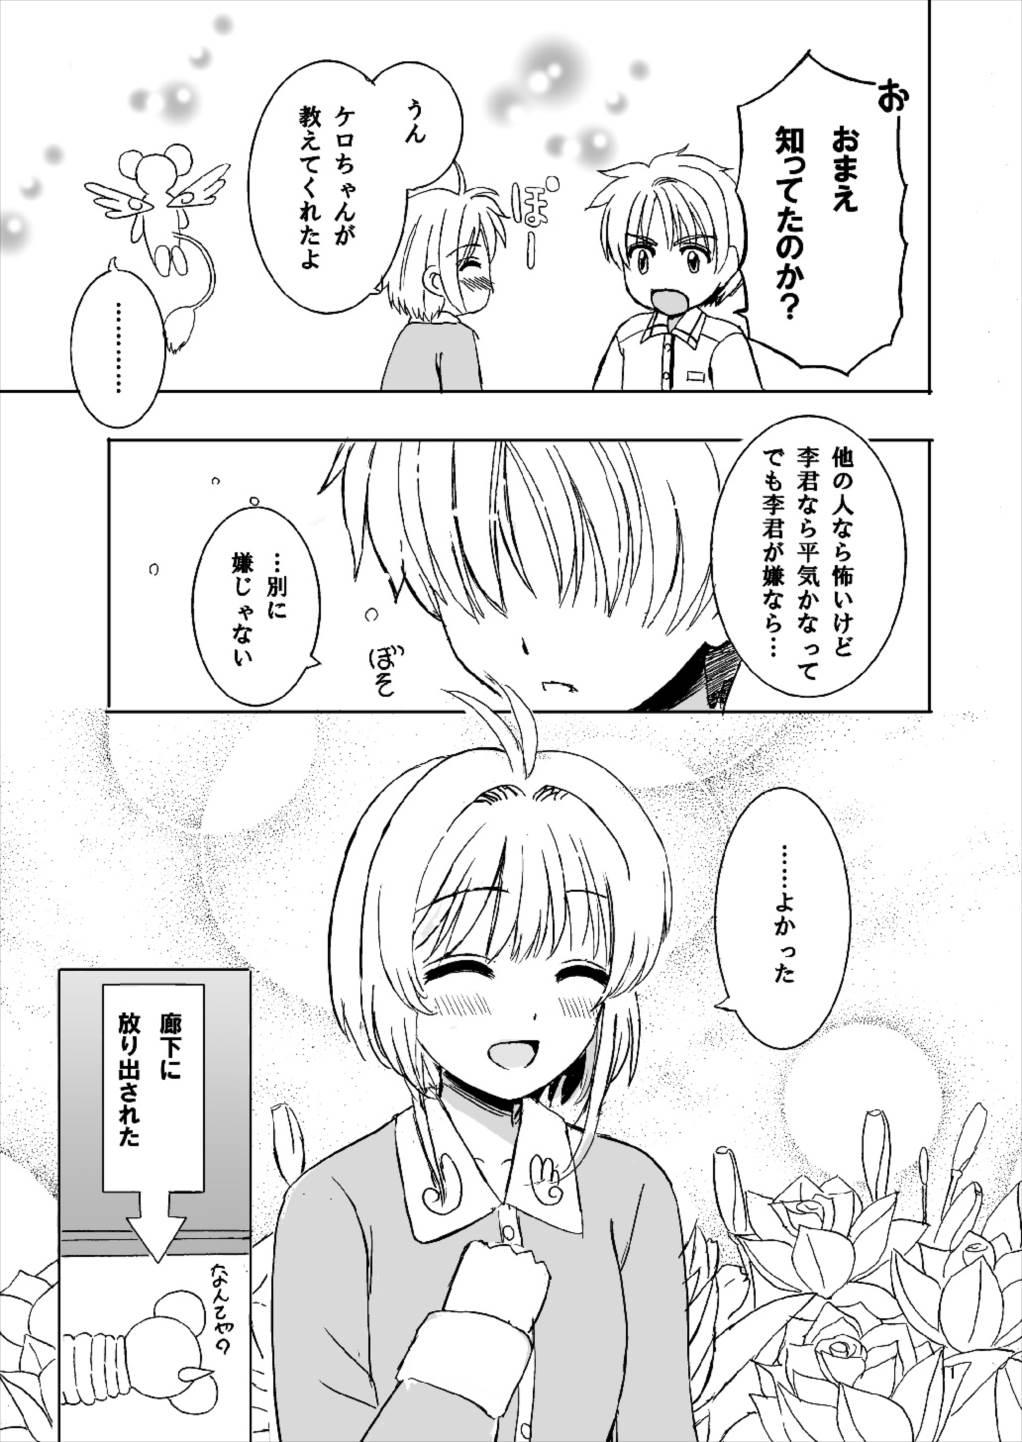 Sakura to Issho! 10